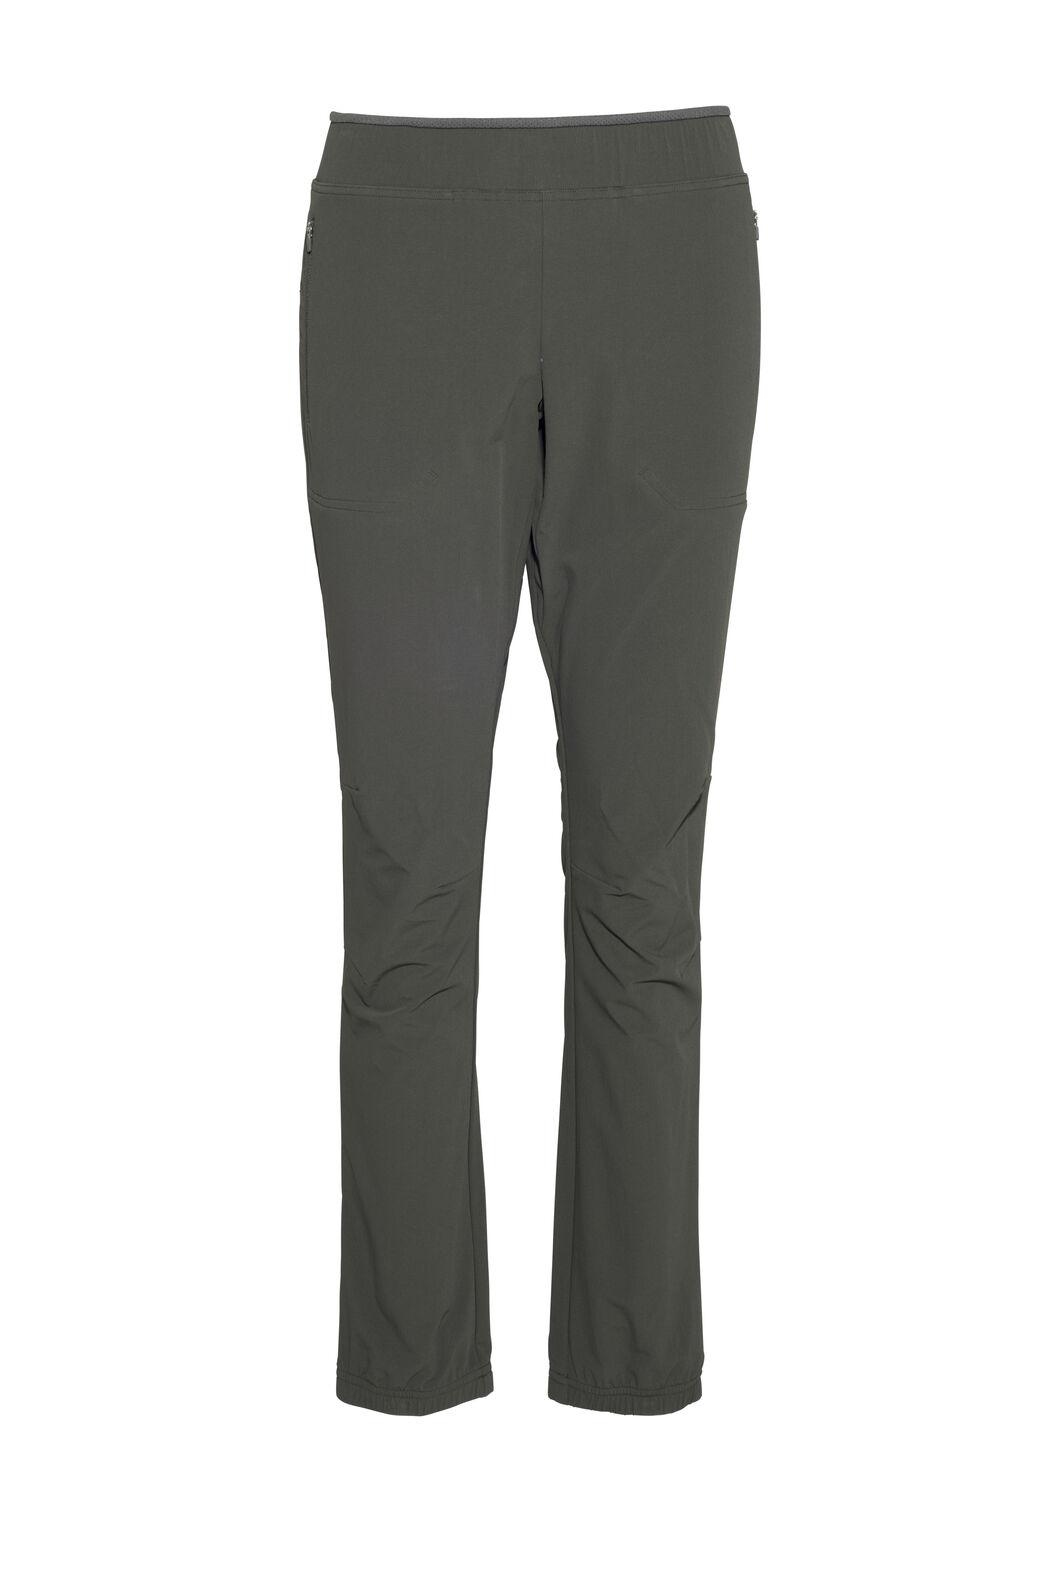 Macpac Hike Tight Pertex® Softshell Pants — Women's, Peat, hi-res